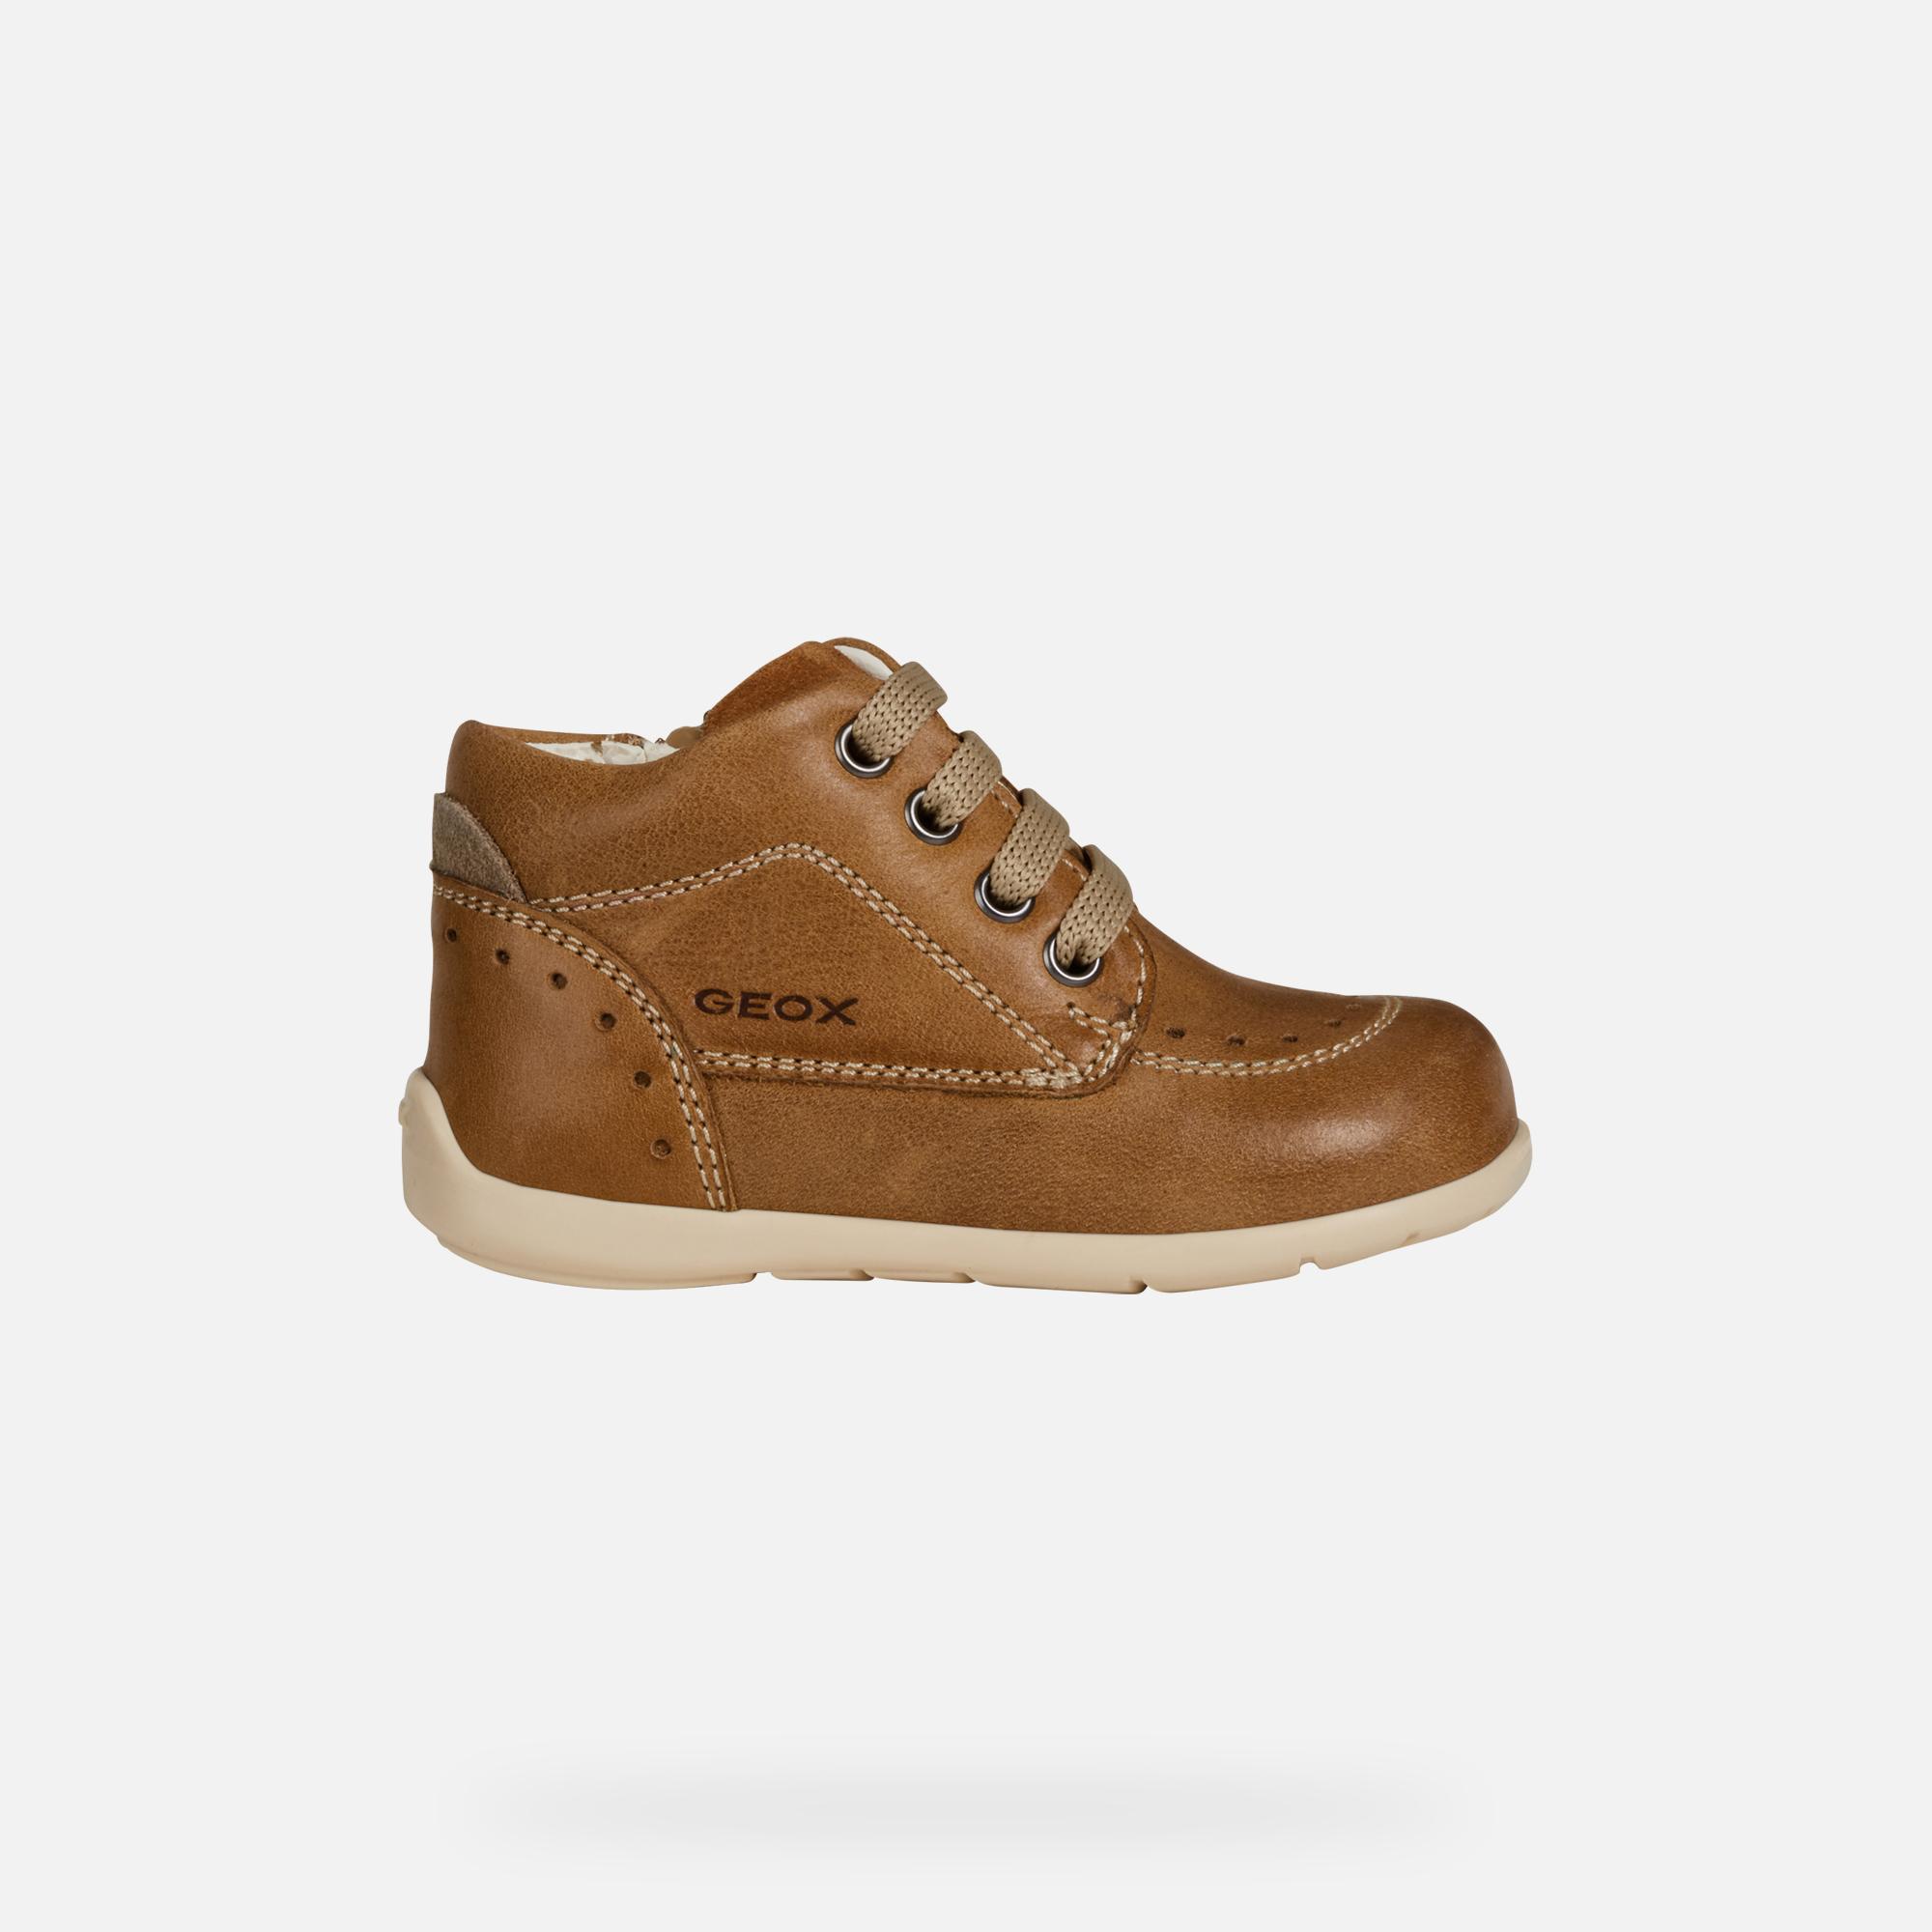 Geox B KAYTAN: Light Brown Baby Boy First Steps Shoes   Geox